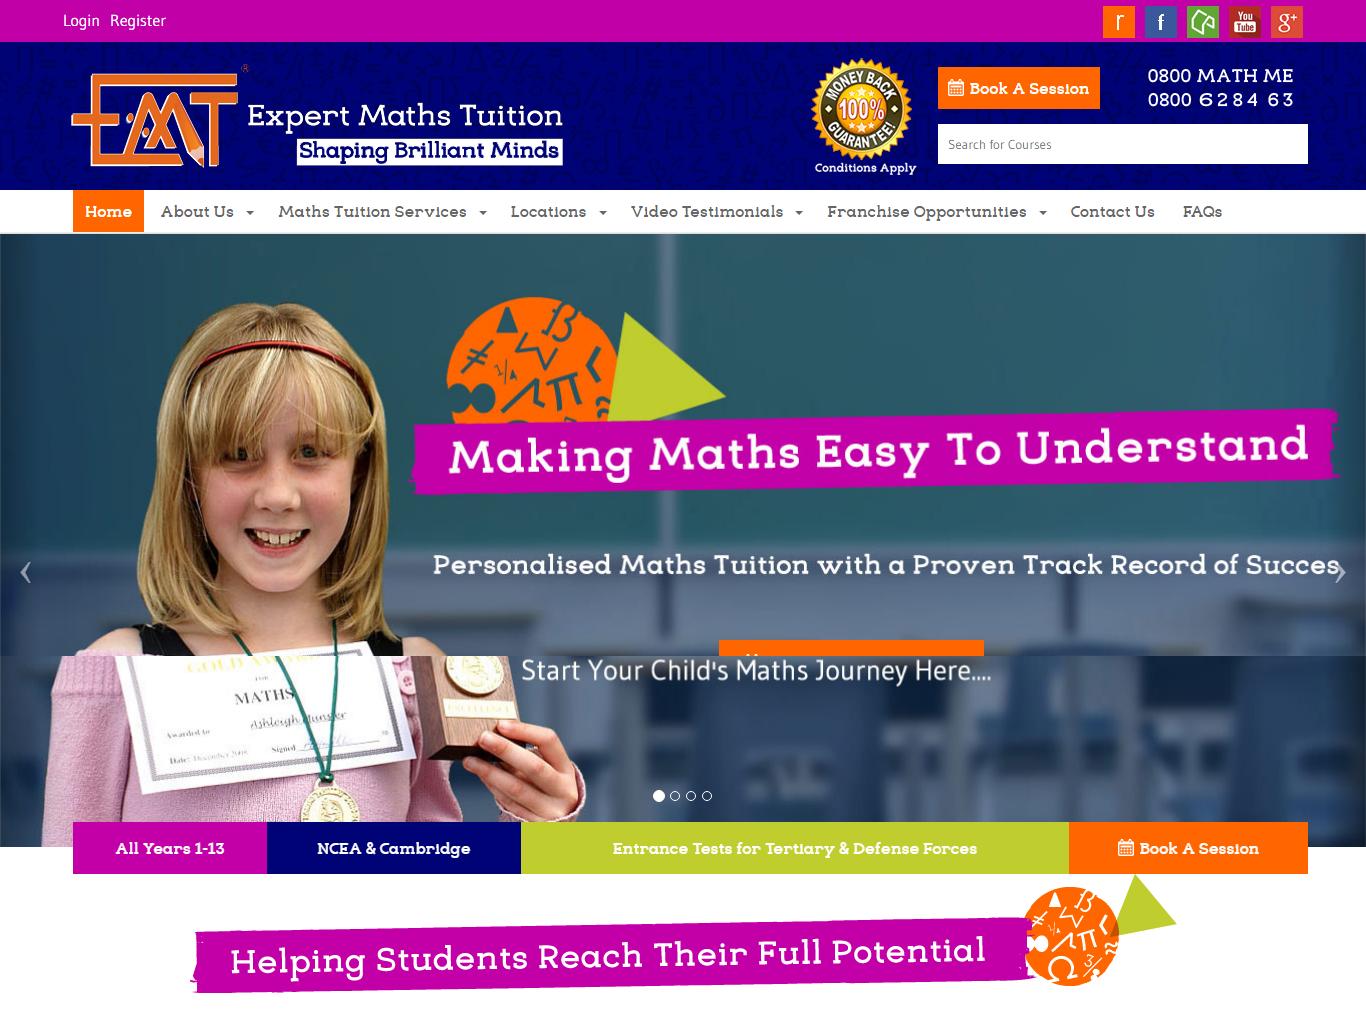 Expert Maths Tuition